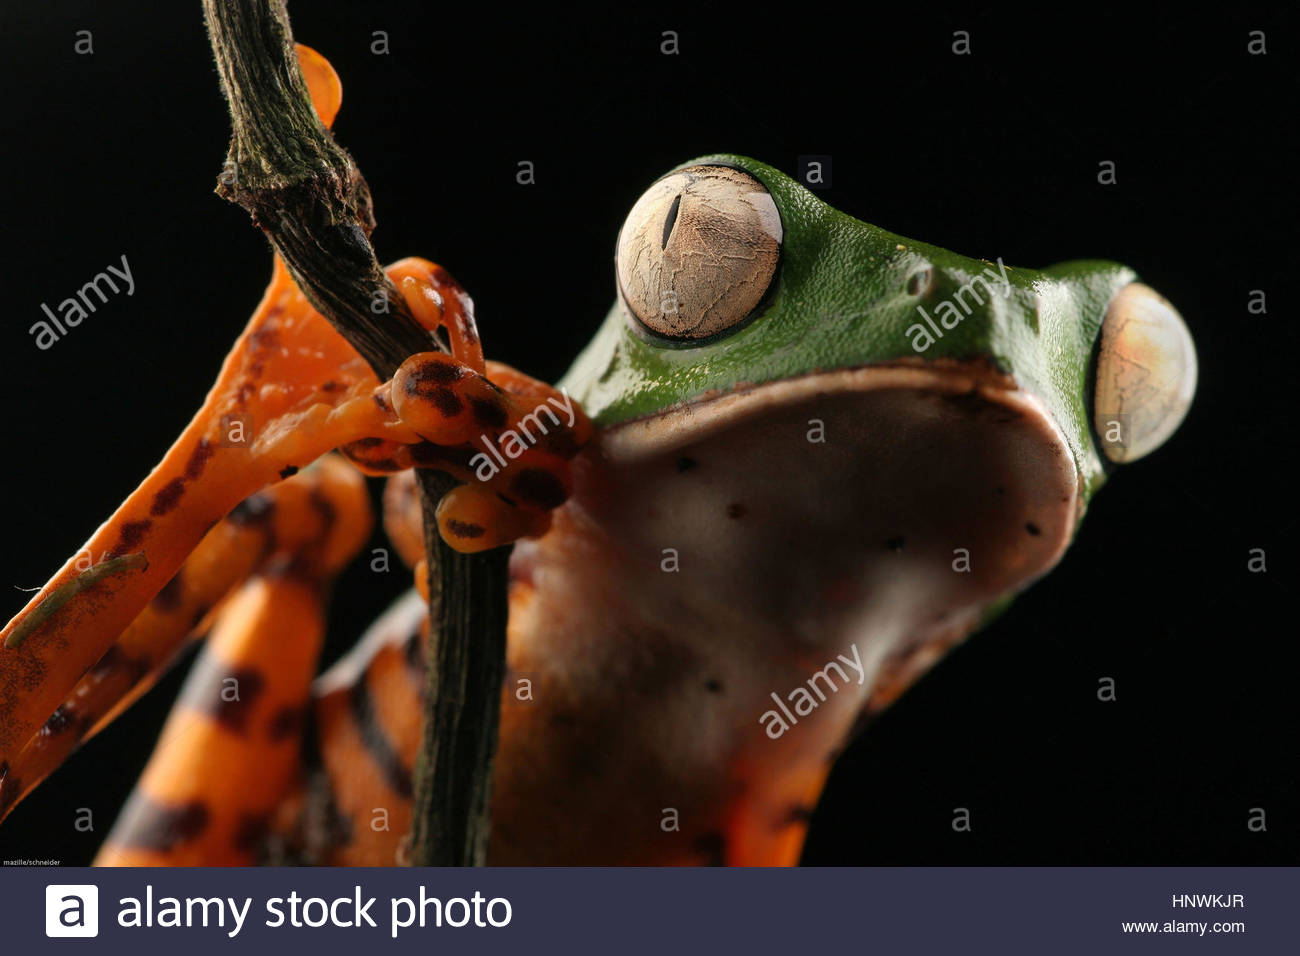 A phyllomedusa tomopterna frog on a tree branch, Guyana. - Stock Image